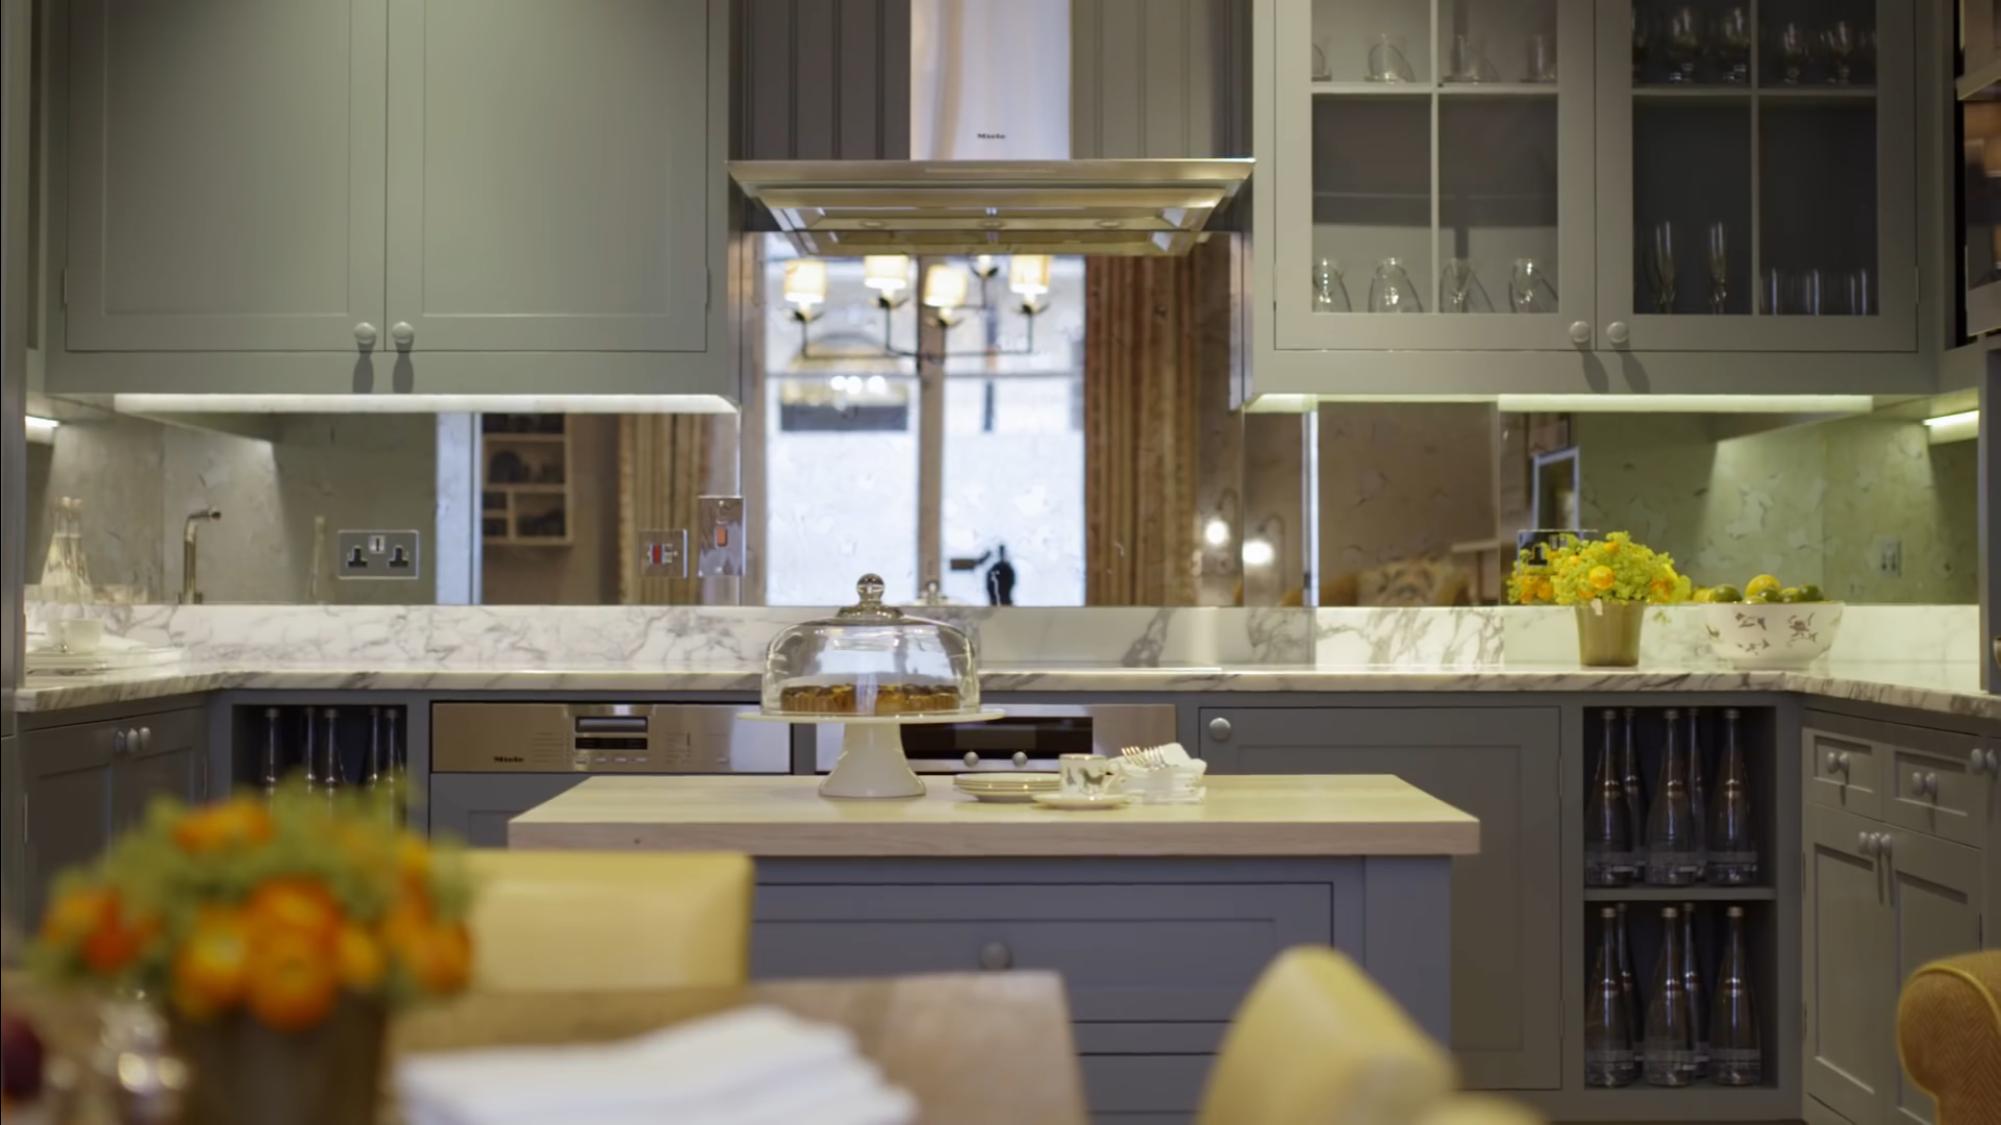 Mirrored backsplash Mirrored backsplash kitchen